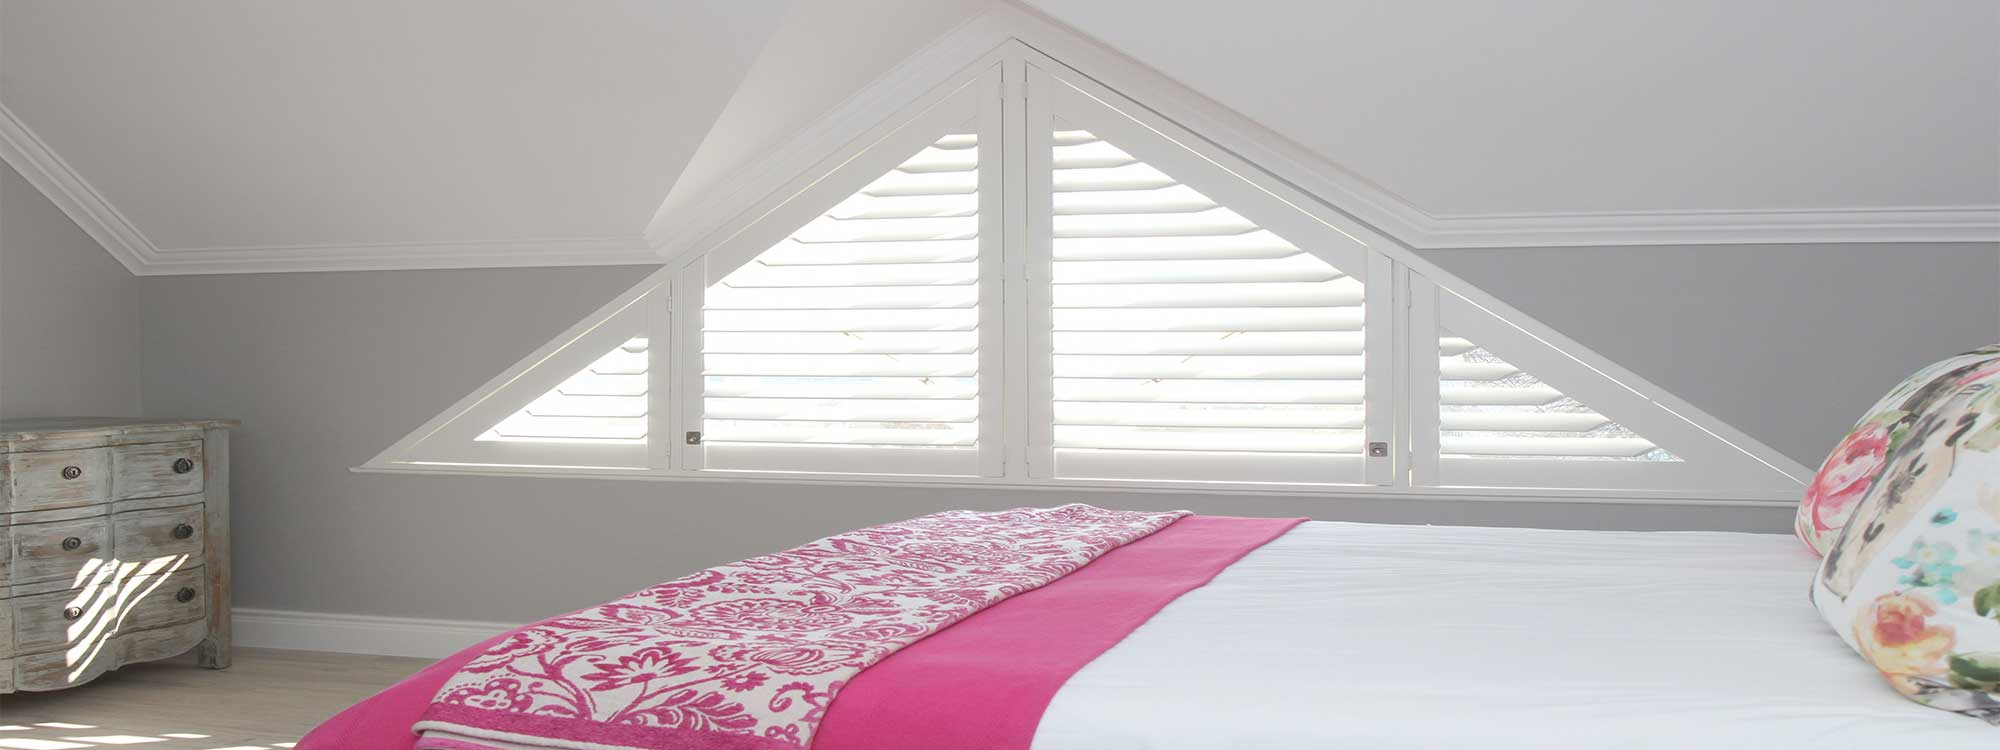 Decowood-shutters-bedroom-custom-shape-pink